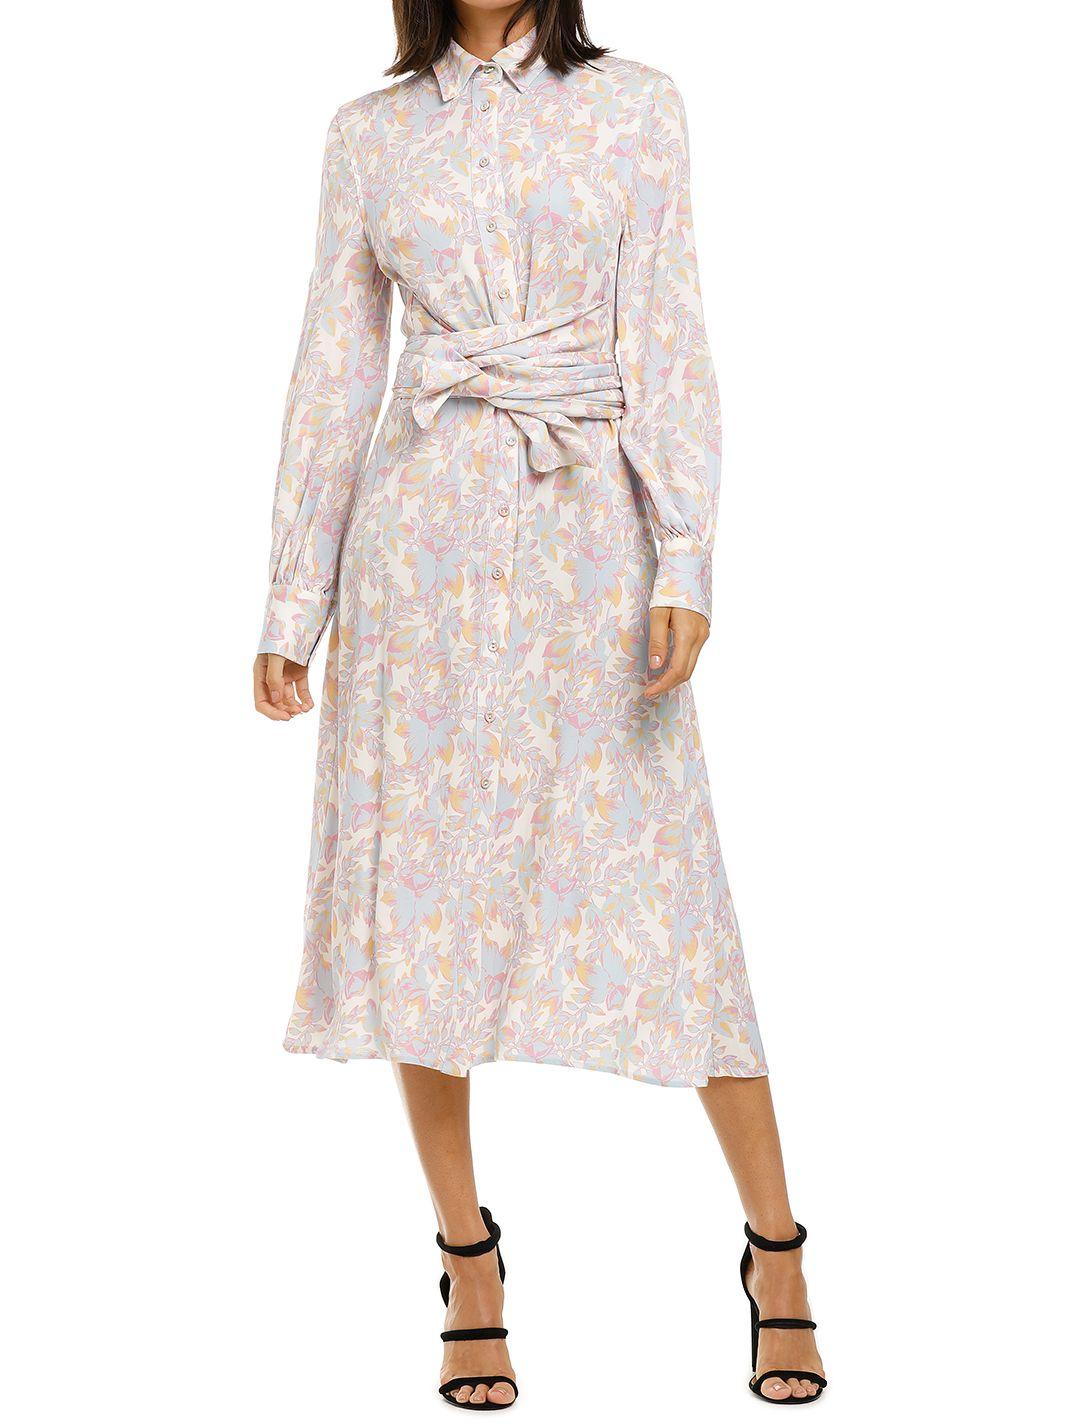 Rebecca-Vallance-Fleur-Midi-Shirt-Dress-Floral-Print-Front